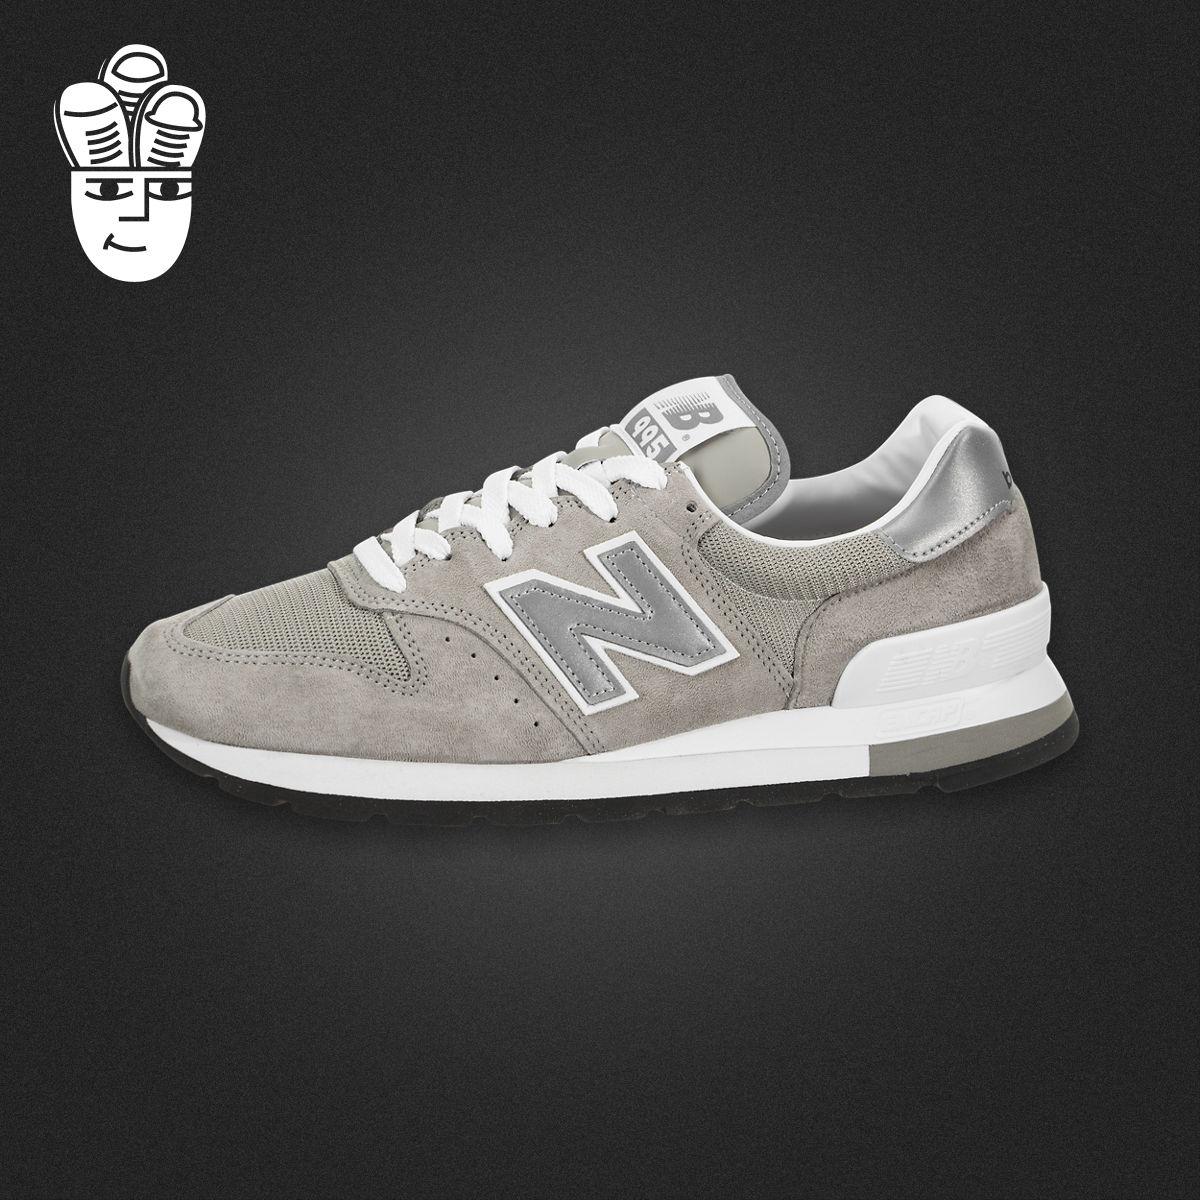 New Balance 995 NB美产男鞋 经典复古跑步鞋 慢跑鞋 运动休闲鞋